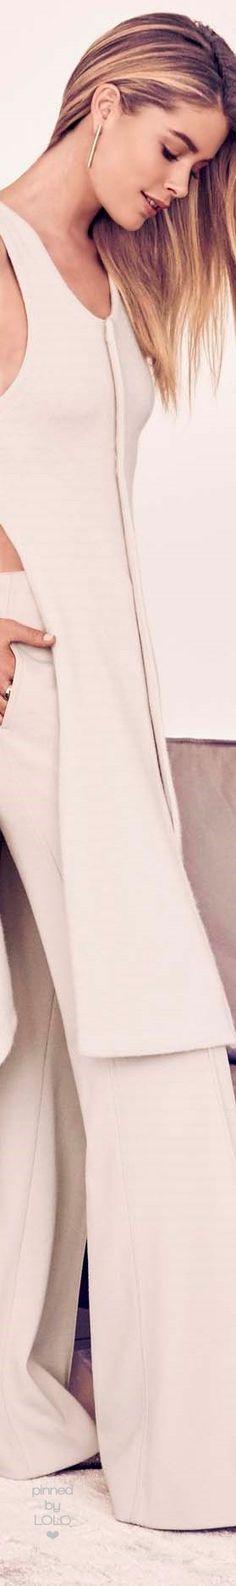 Doutzen Kroes Bloomberg Pursuits | LOLO❤︎ Fashion 2017, Women's Fashion Dresses, Fashion Models, Womens Fashion, Fashion Tips, Fashion Trends, Doutzen Kroes, White Fashion, Feminine Style